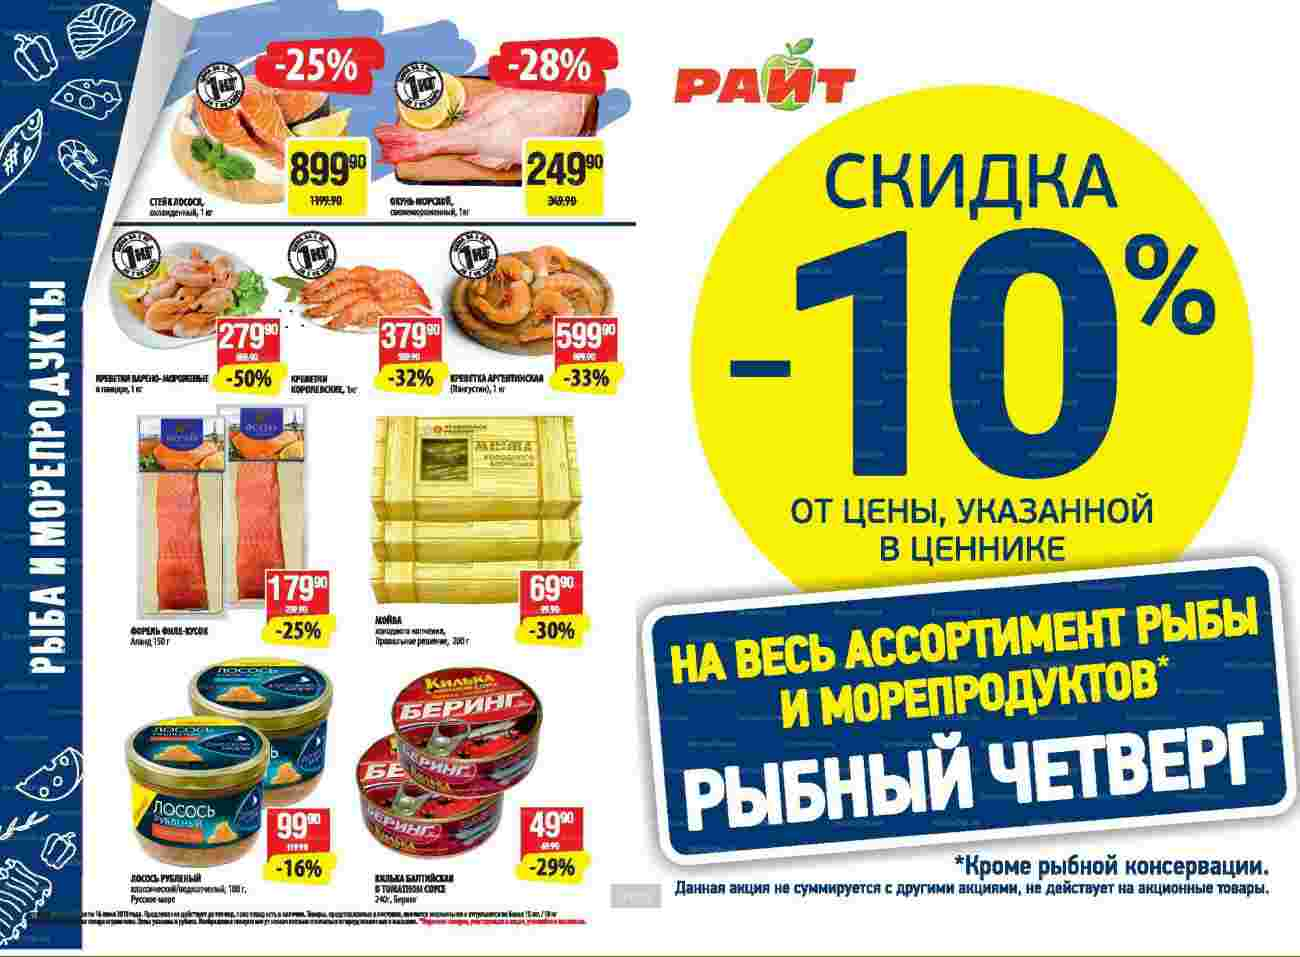 Каталог гипермаркетов РАЙТ 10-16.06.2019 стр.6